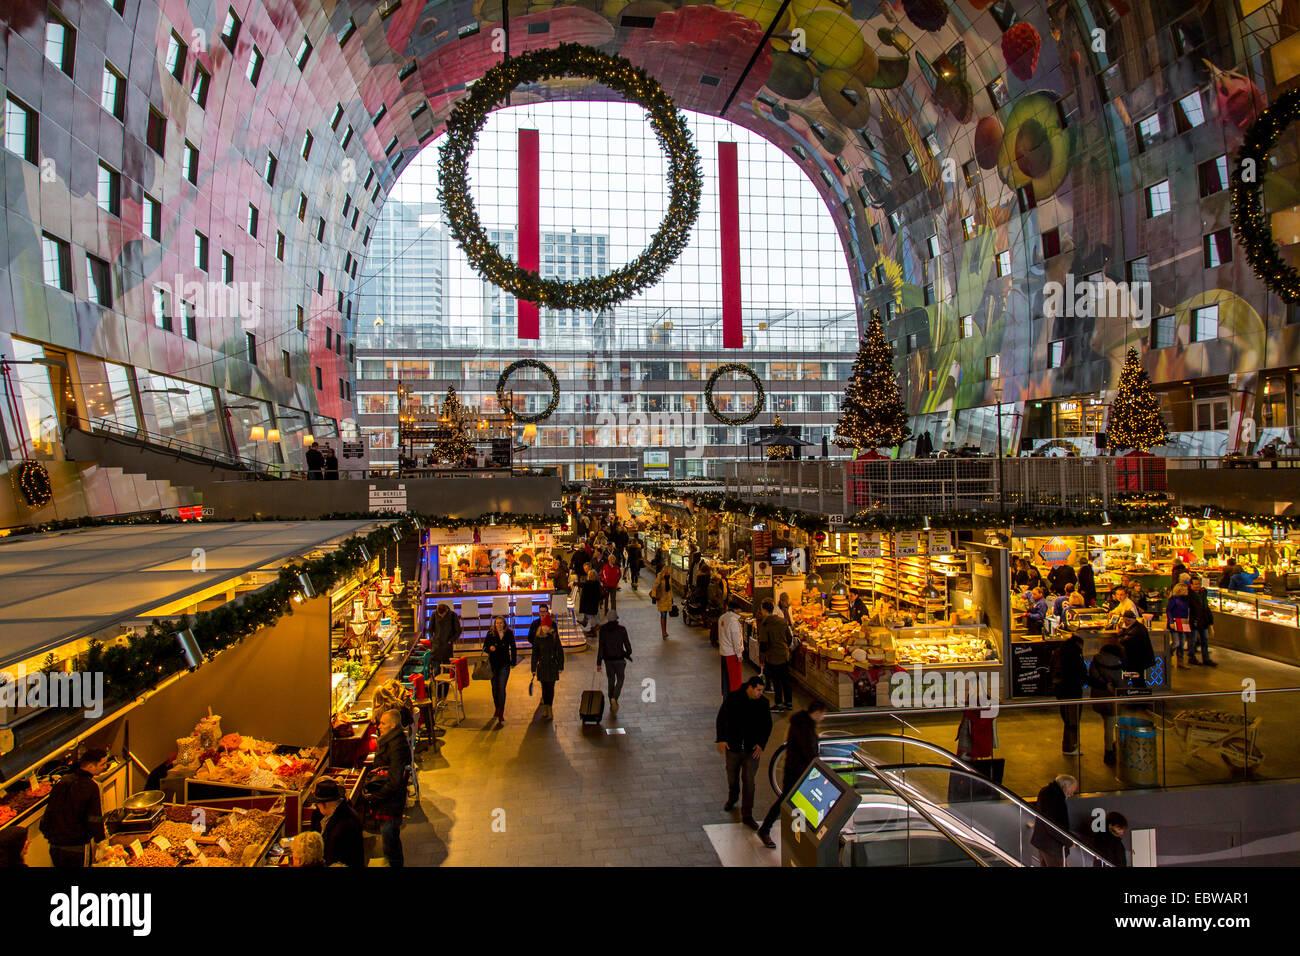 The New Market Hall In Rotterdam Restaurants Food Shops Market Stock Photo 76159973 Alamy